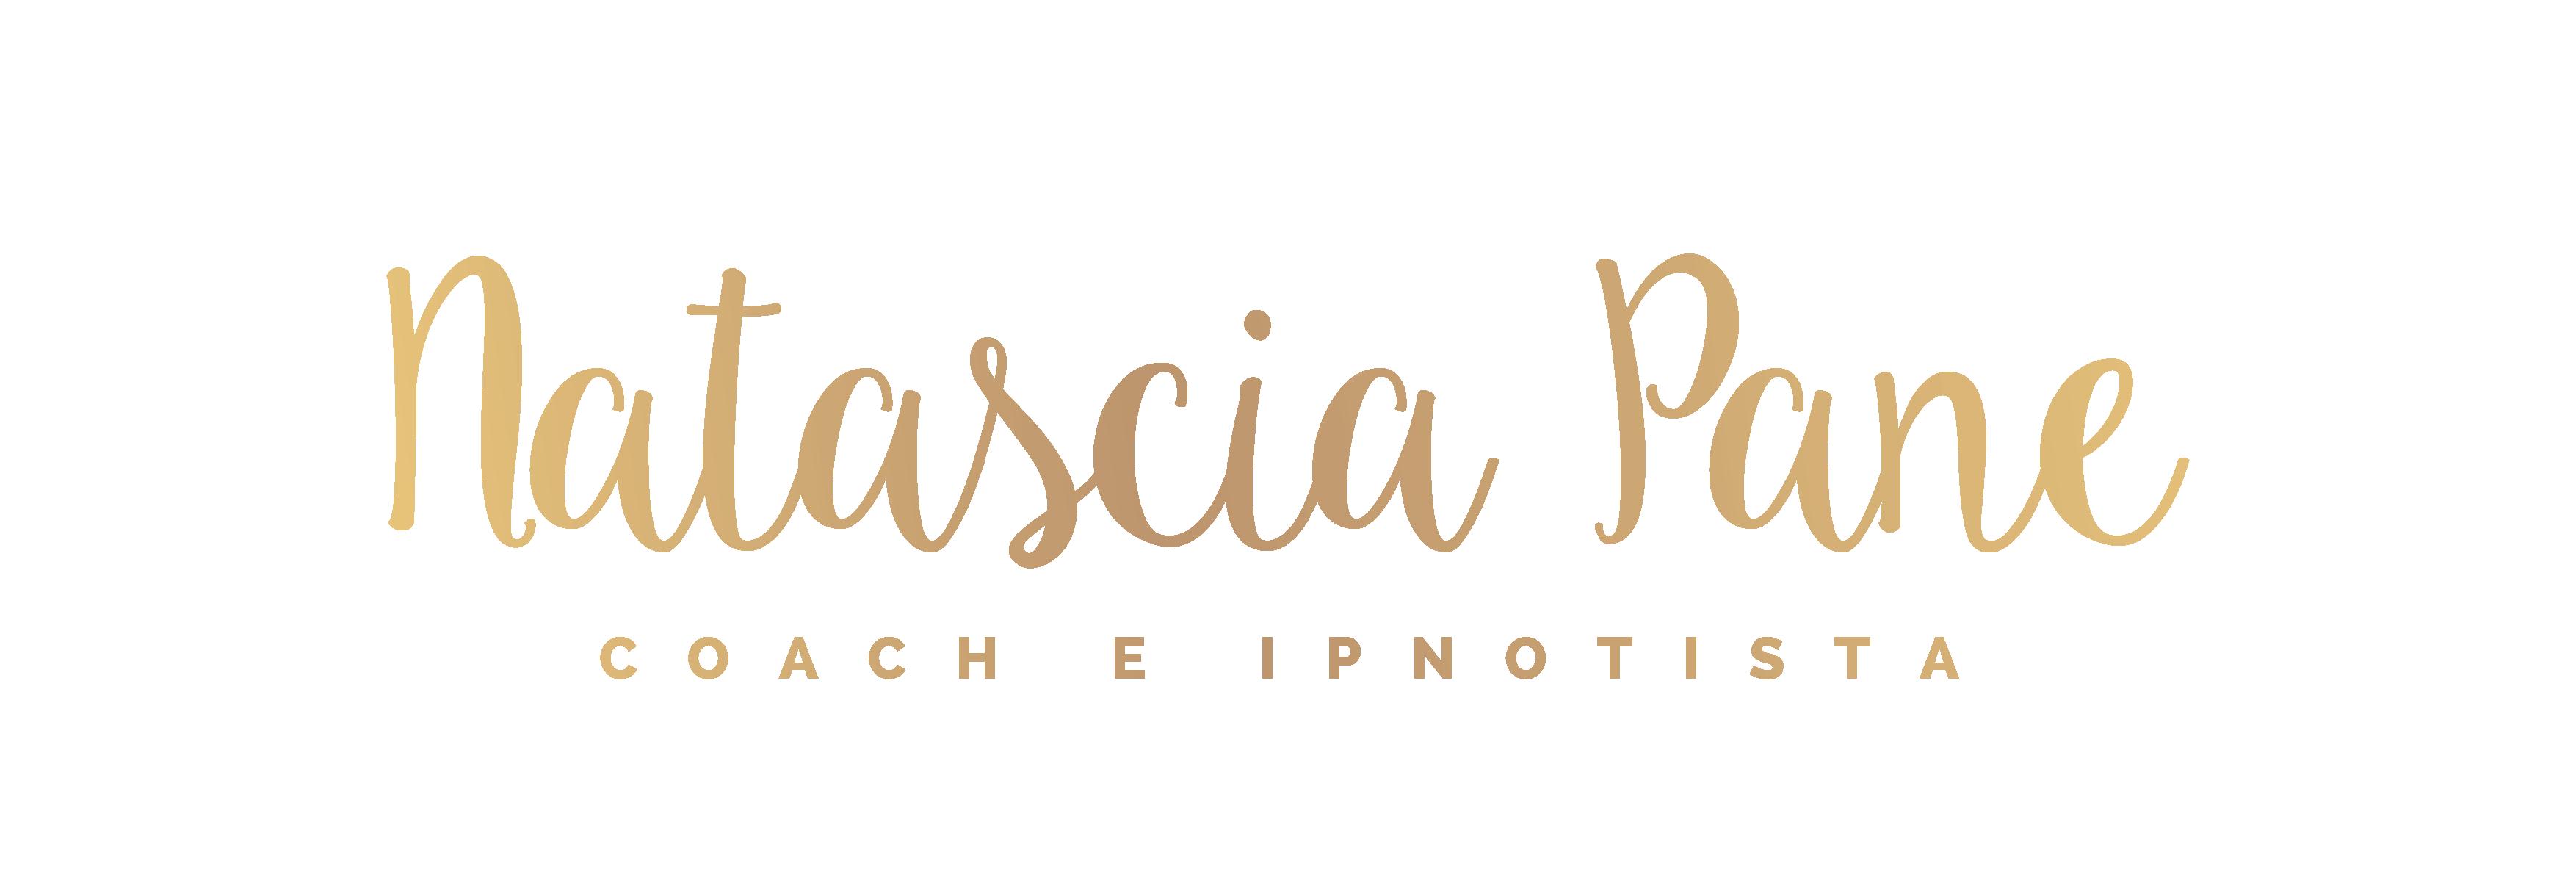 Natascia Pane, Coach e Ipnotista